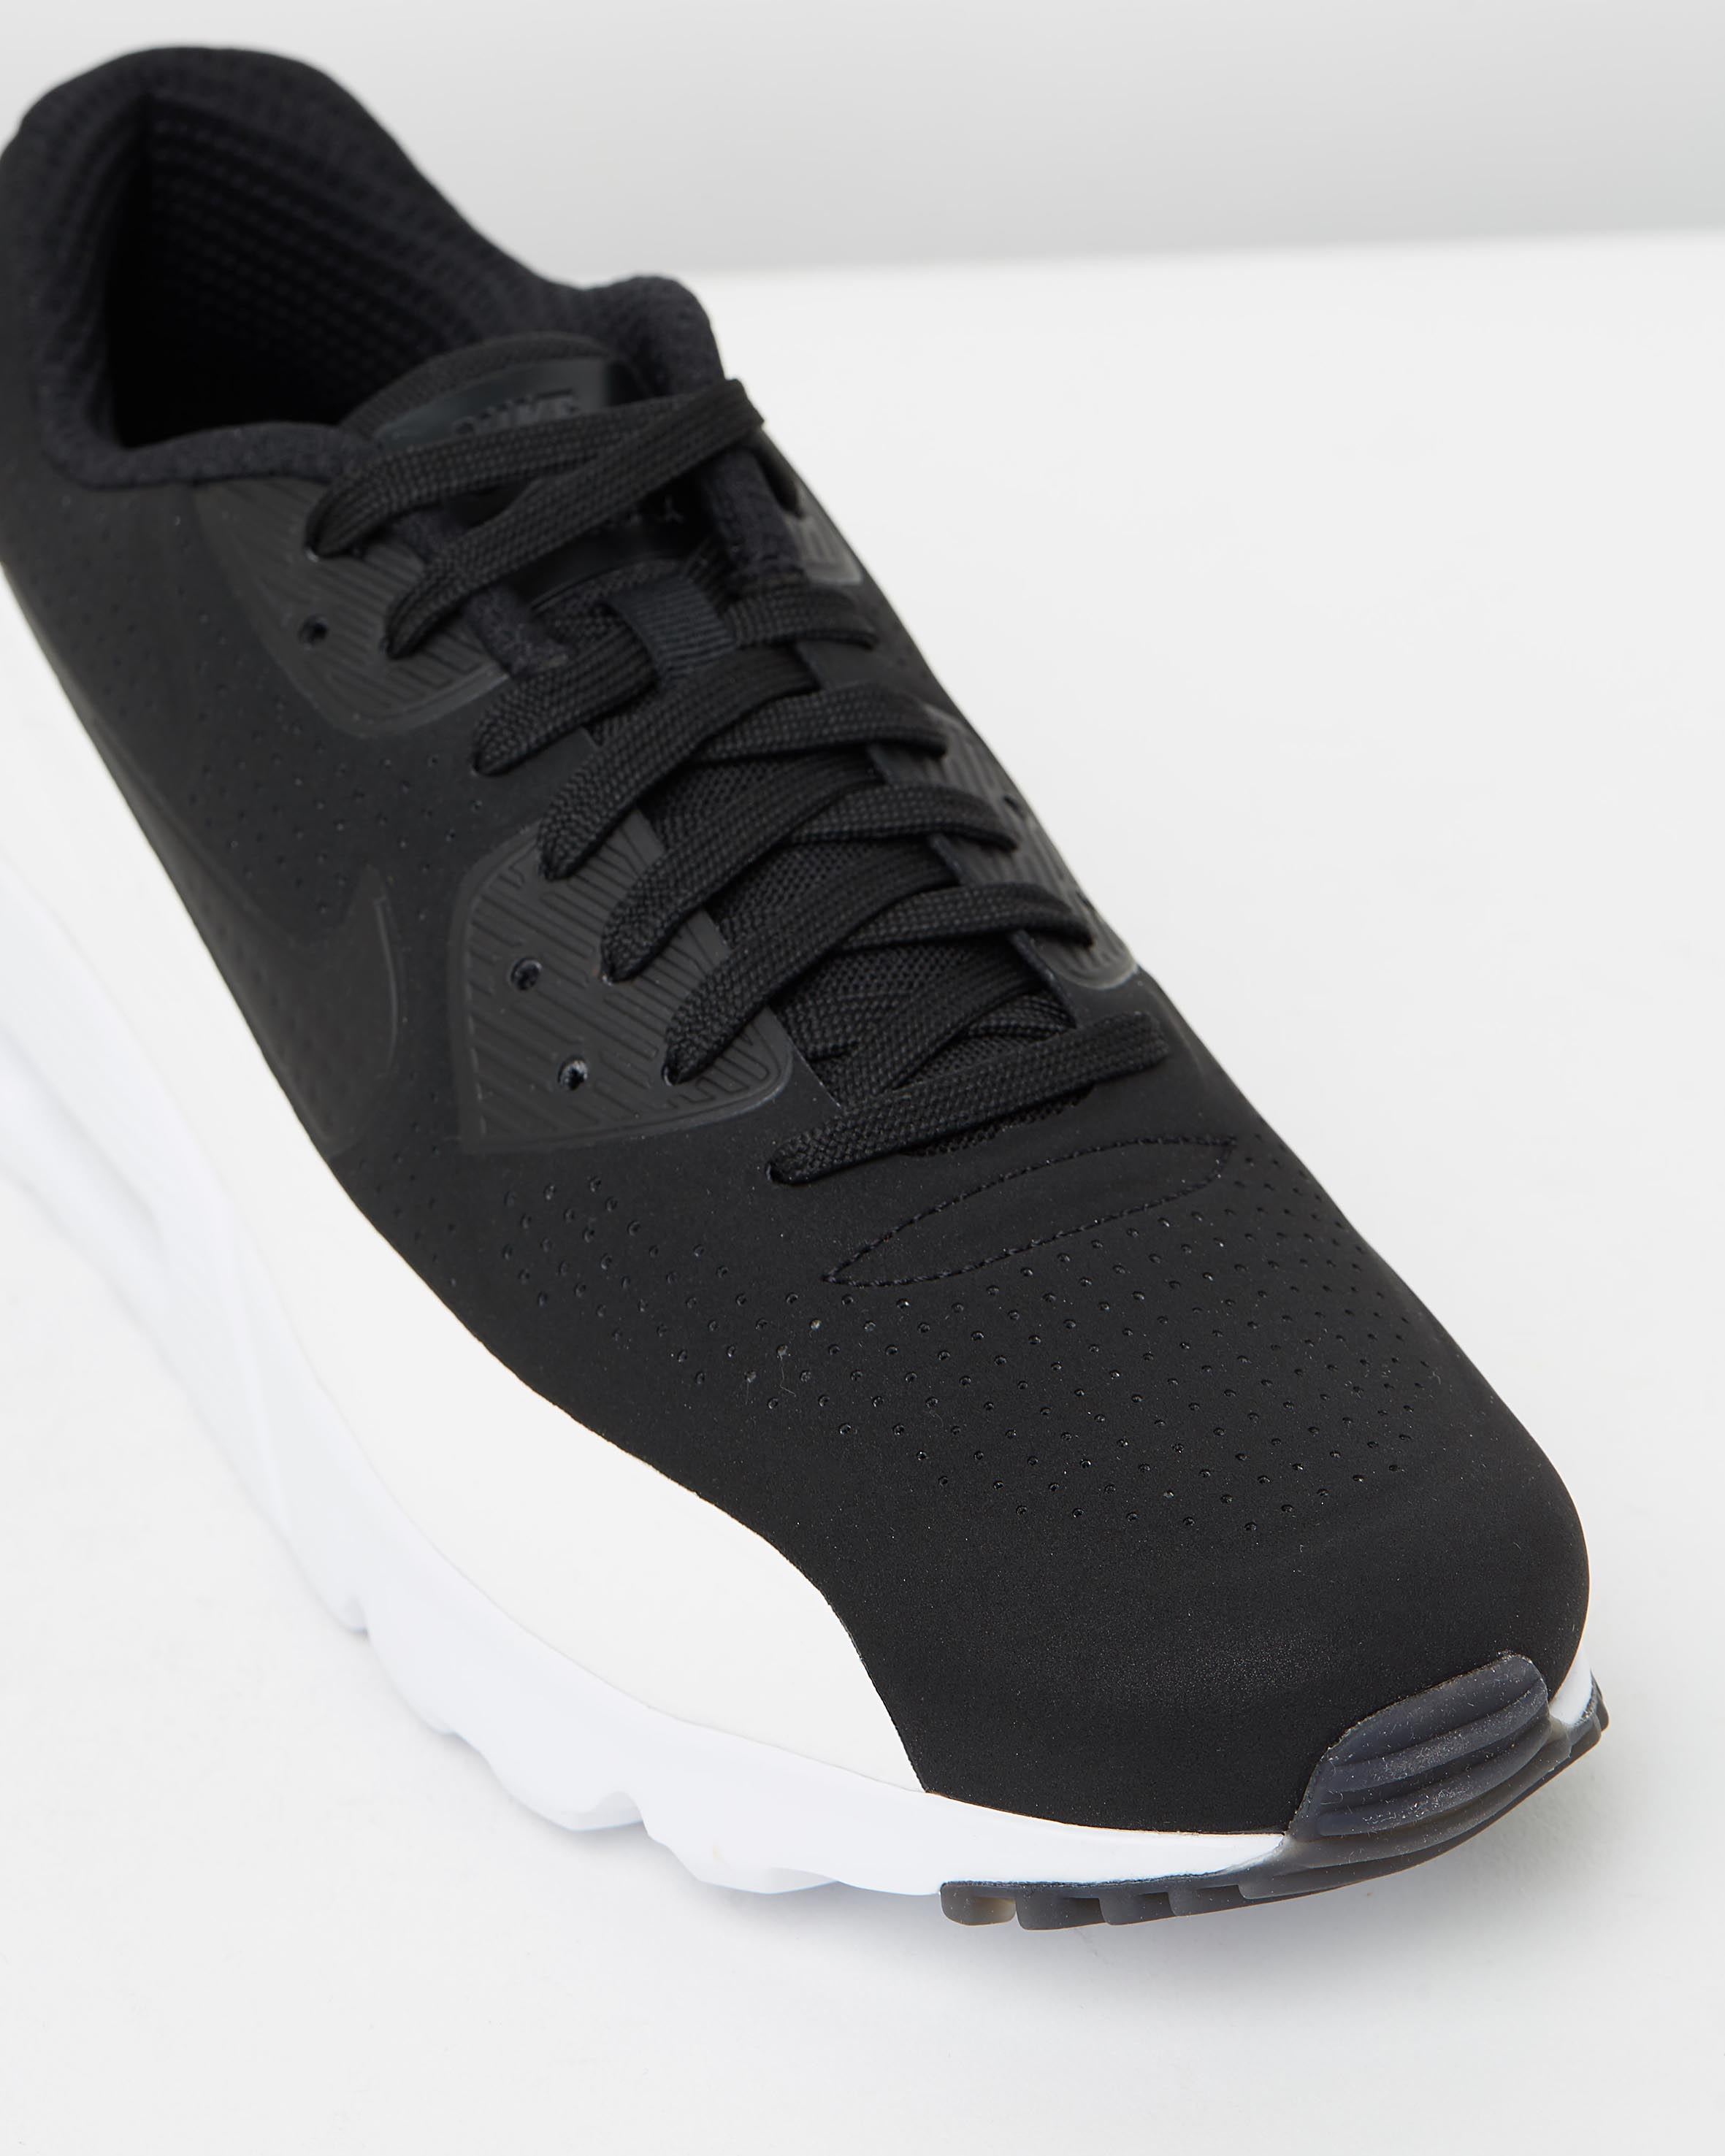 best sneakers f9b73 e2308 ... Nike Air Max 90 Ultra Moire Black White 4